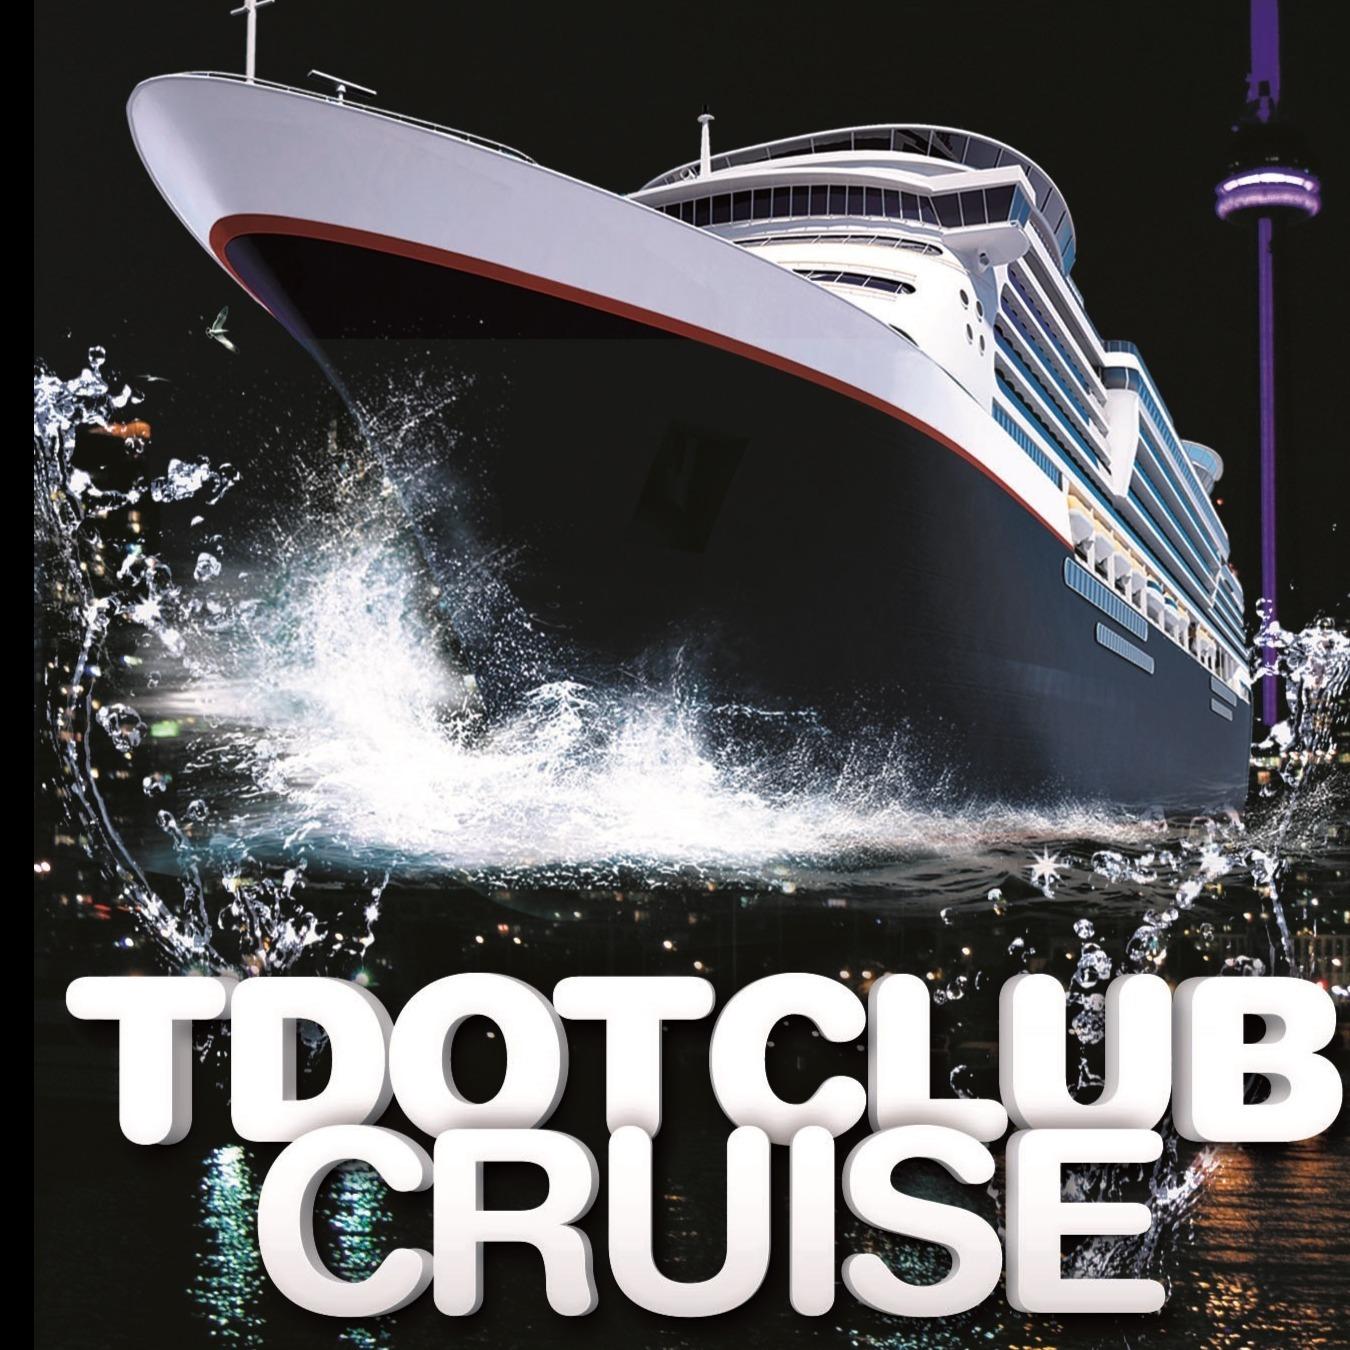 Tdotclub Booze Cruise